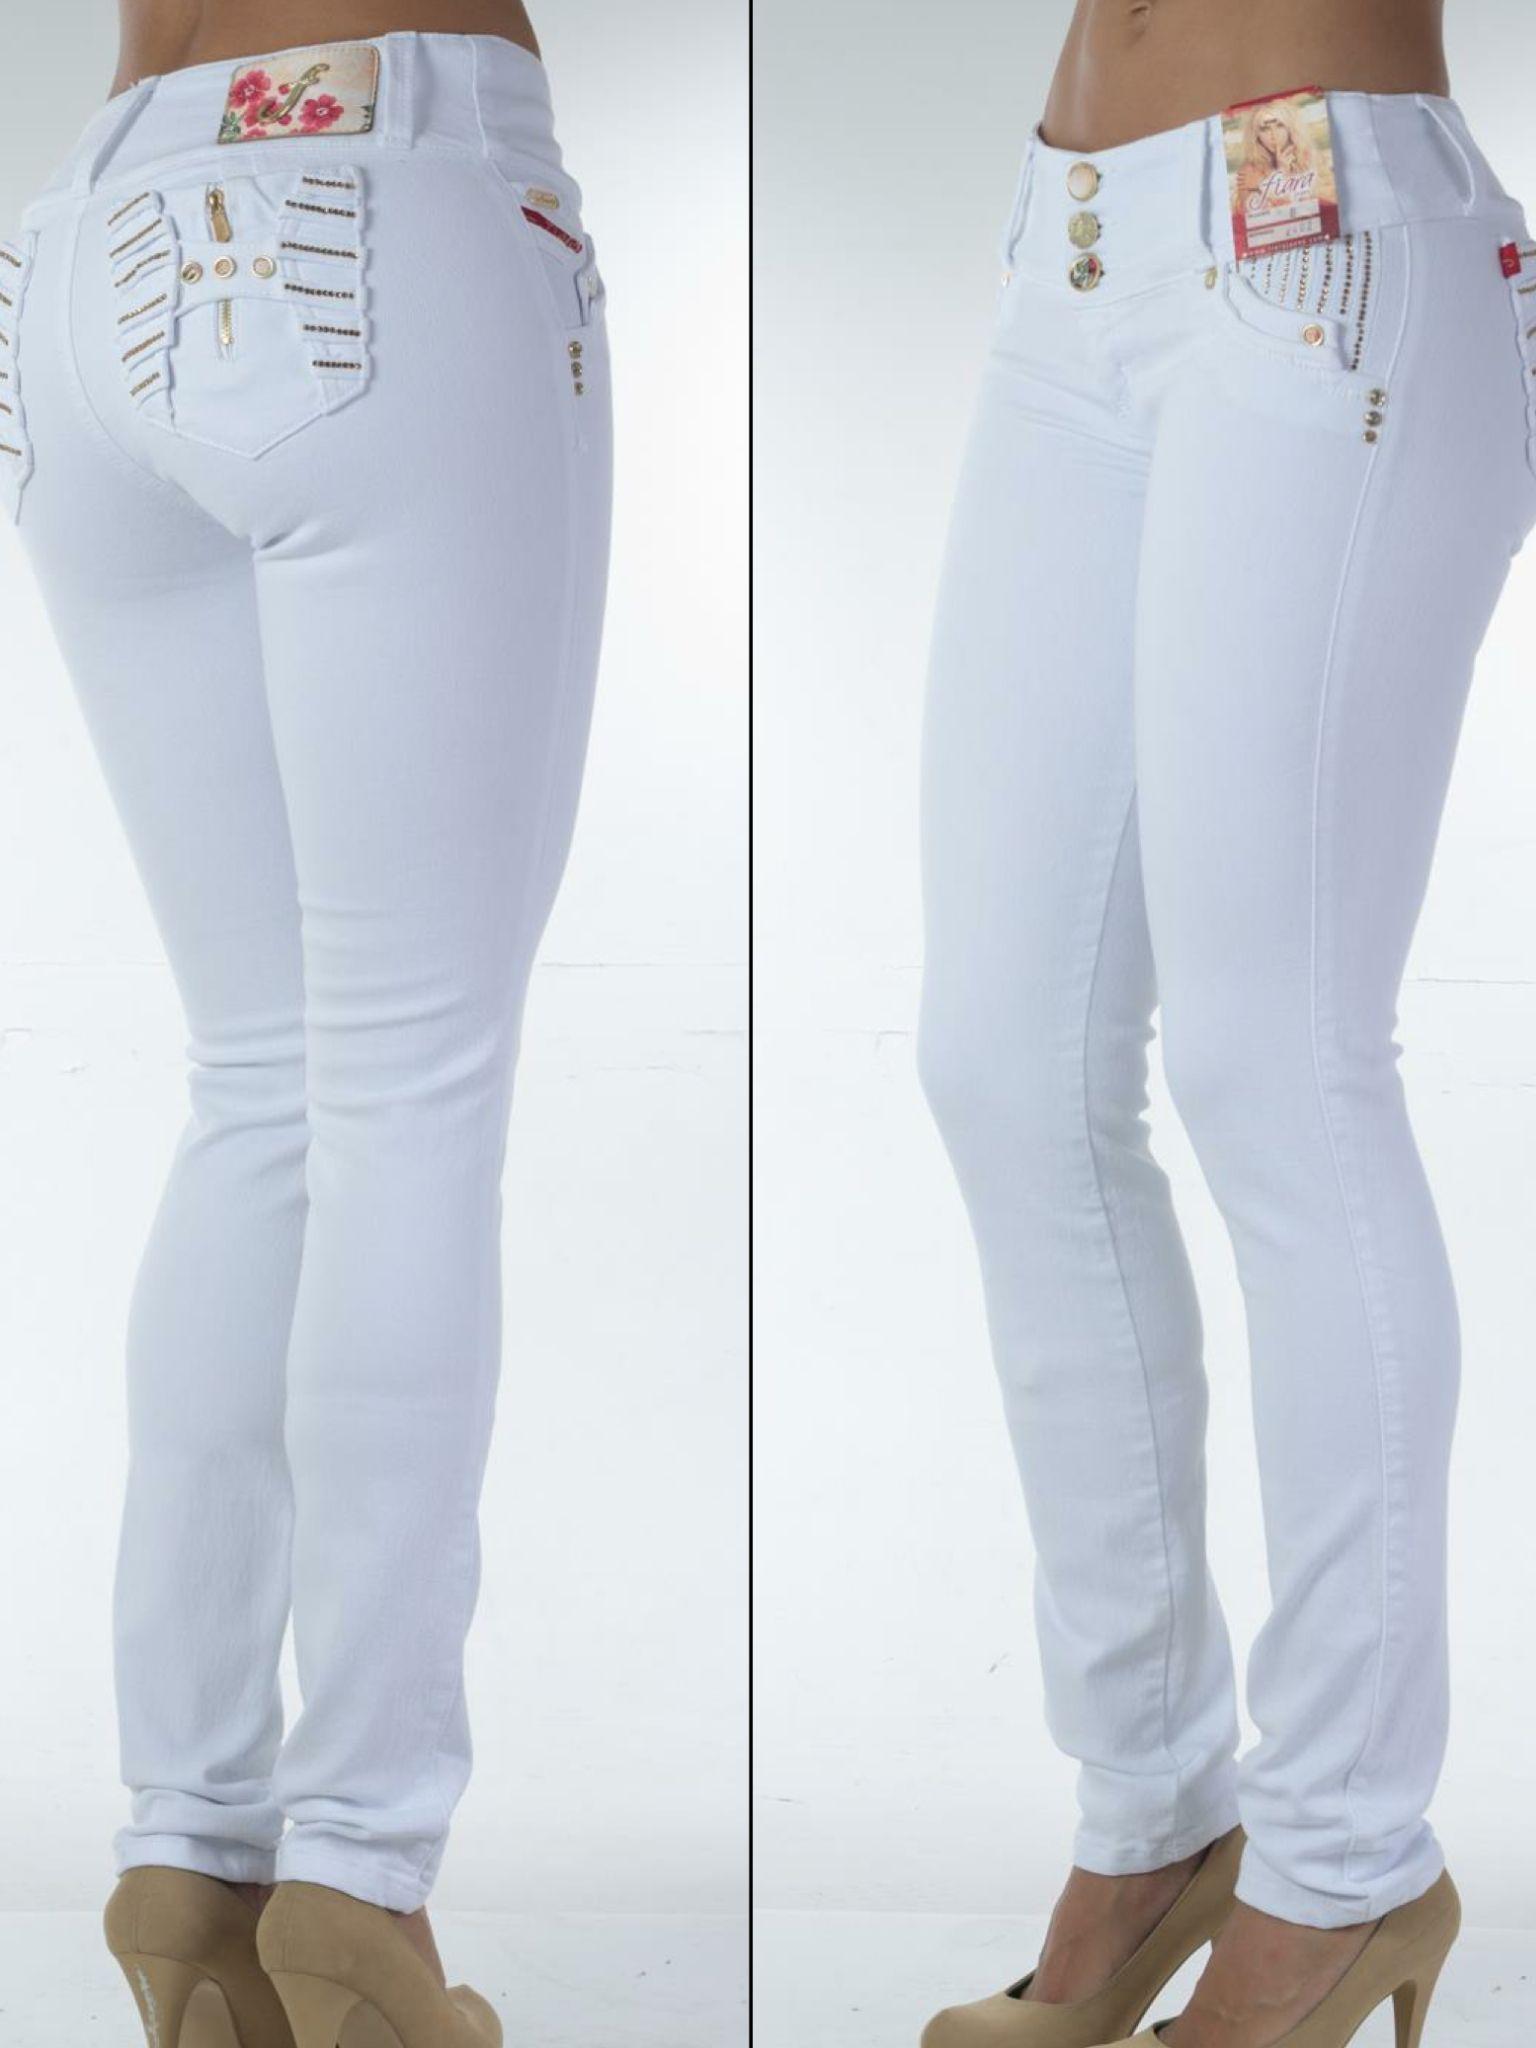 Colombian skinny stretch jean shop online www.jeans2die4.com.au